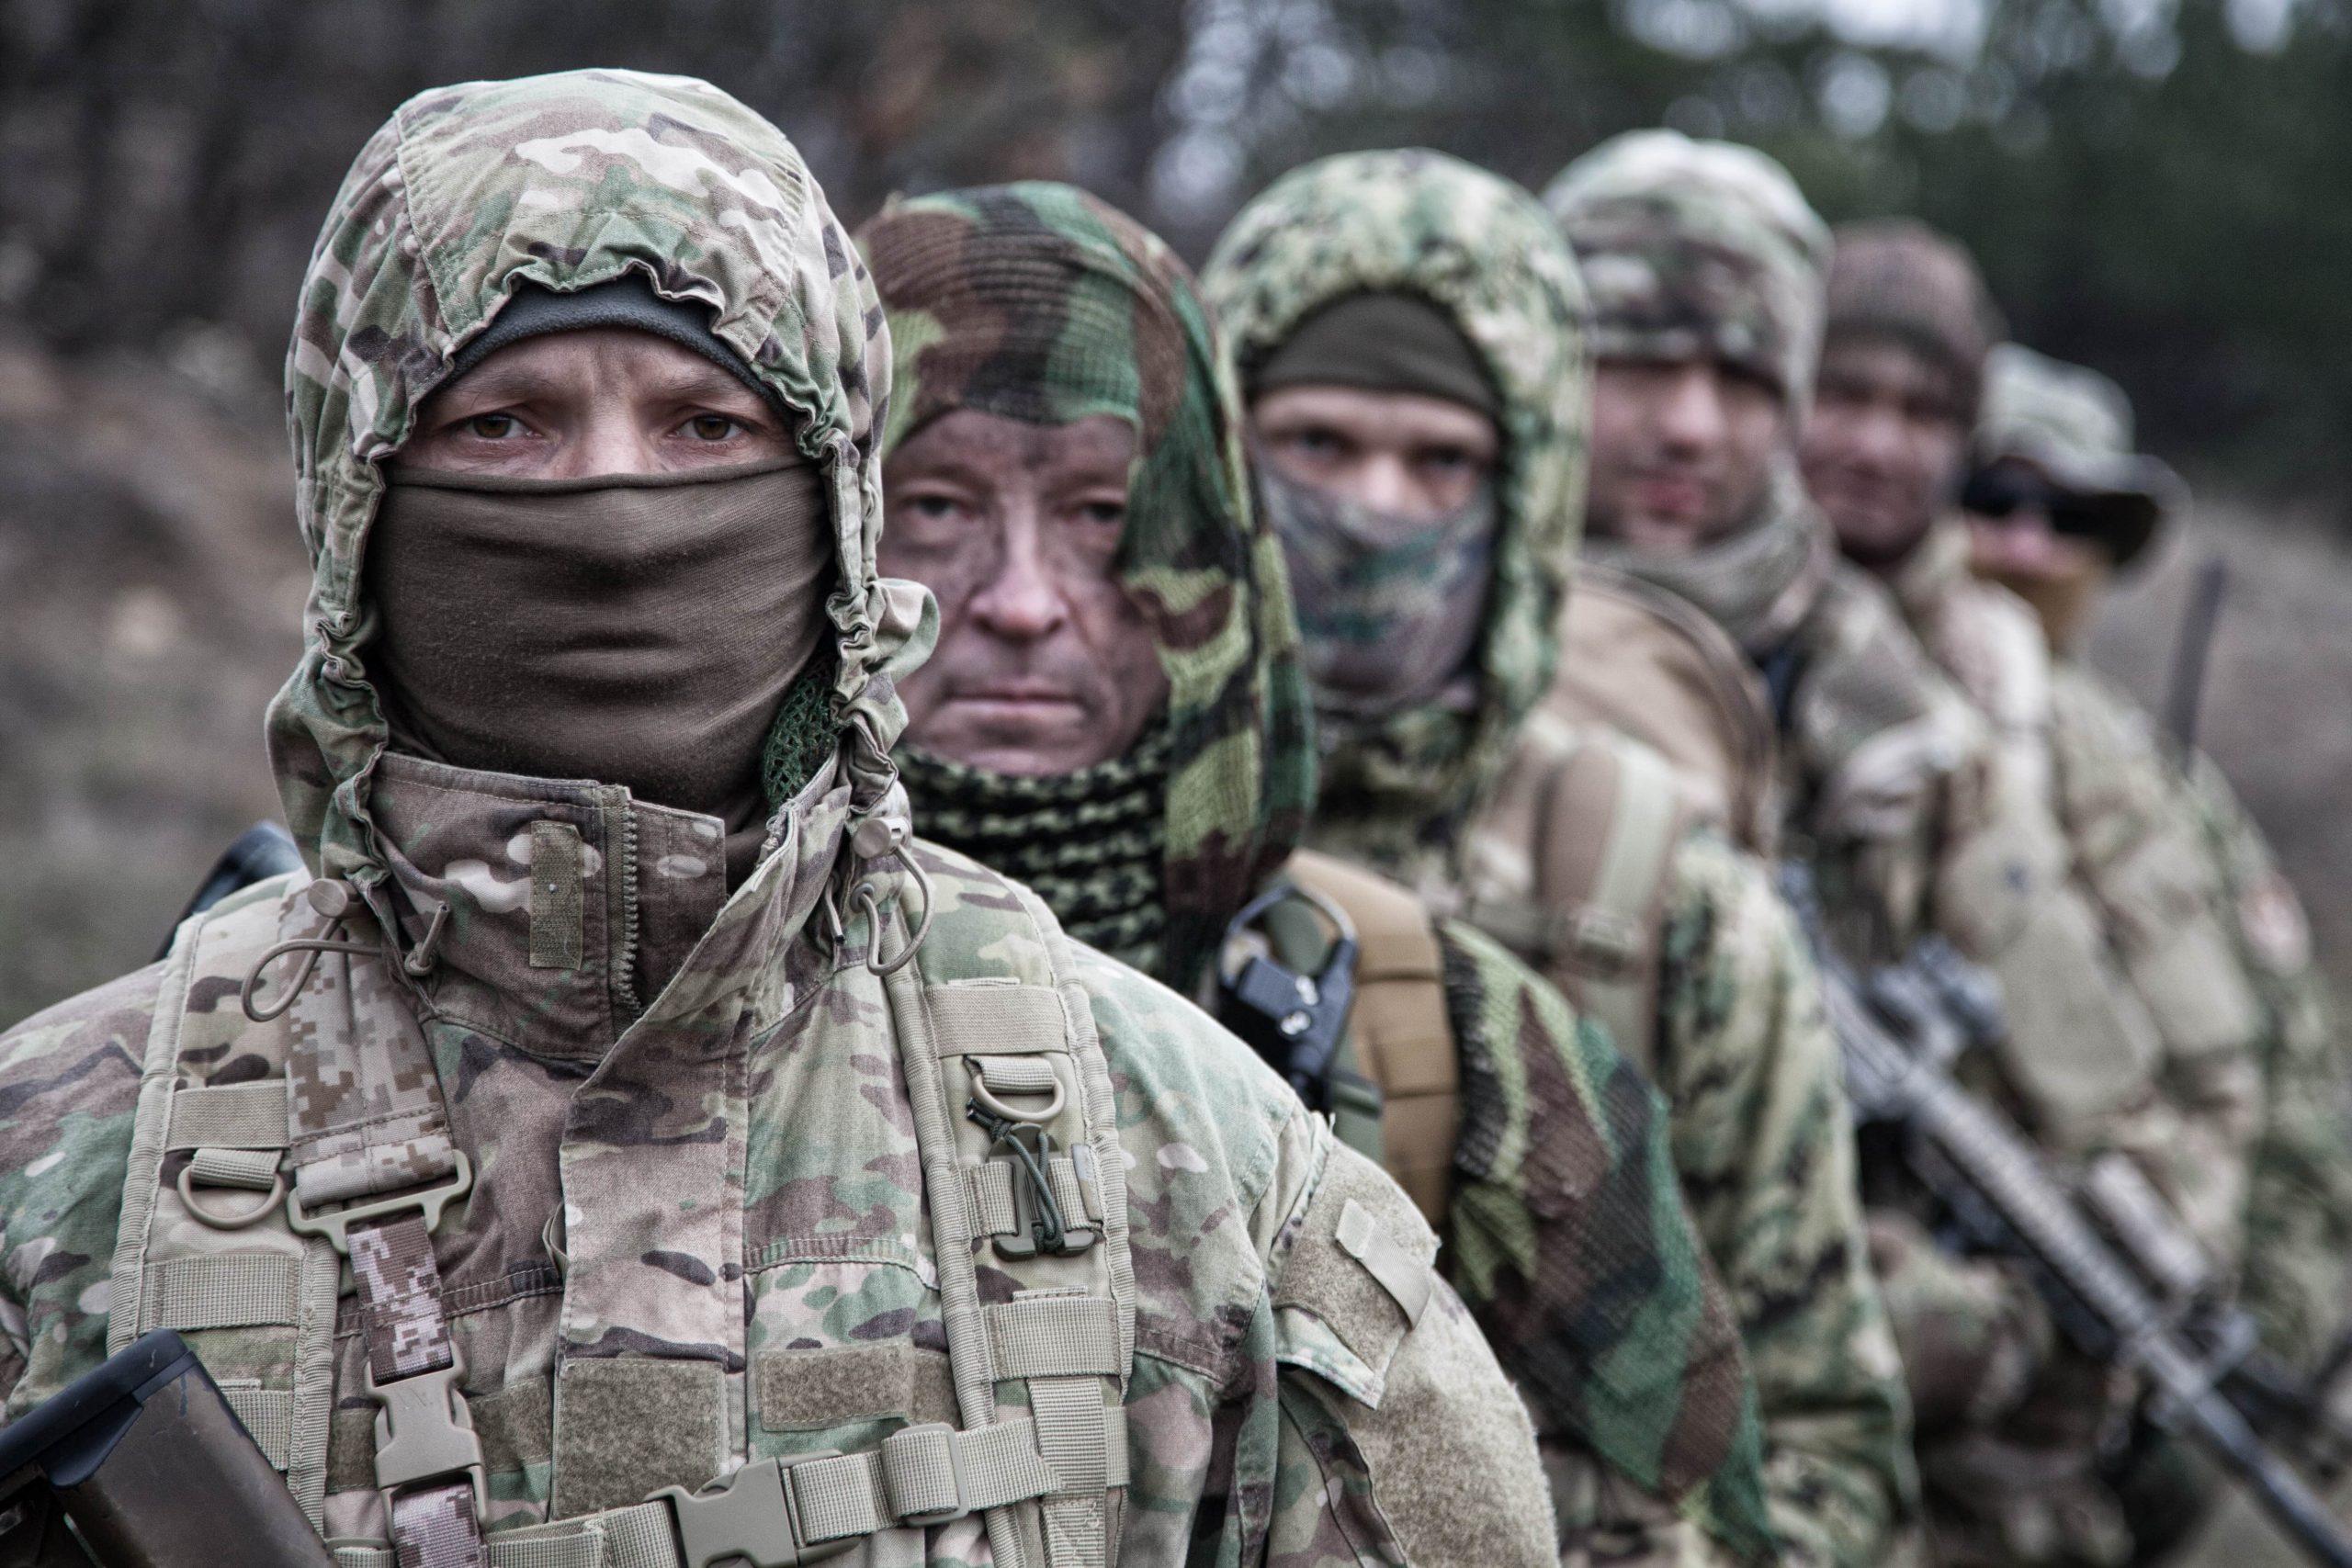 army-elite-forces-tactical-soldiers-group-portrait-MNRQF3F-min